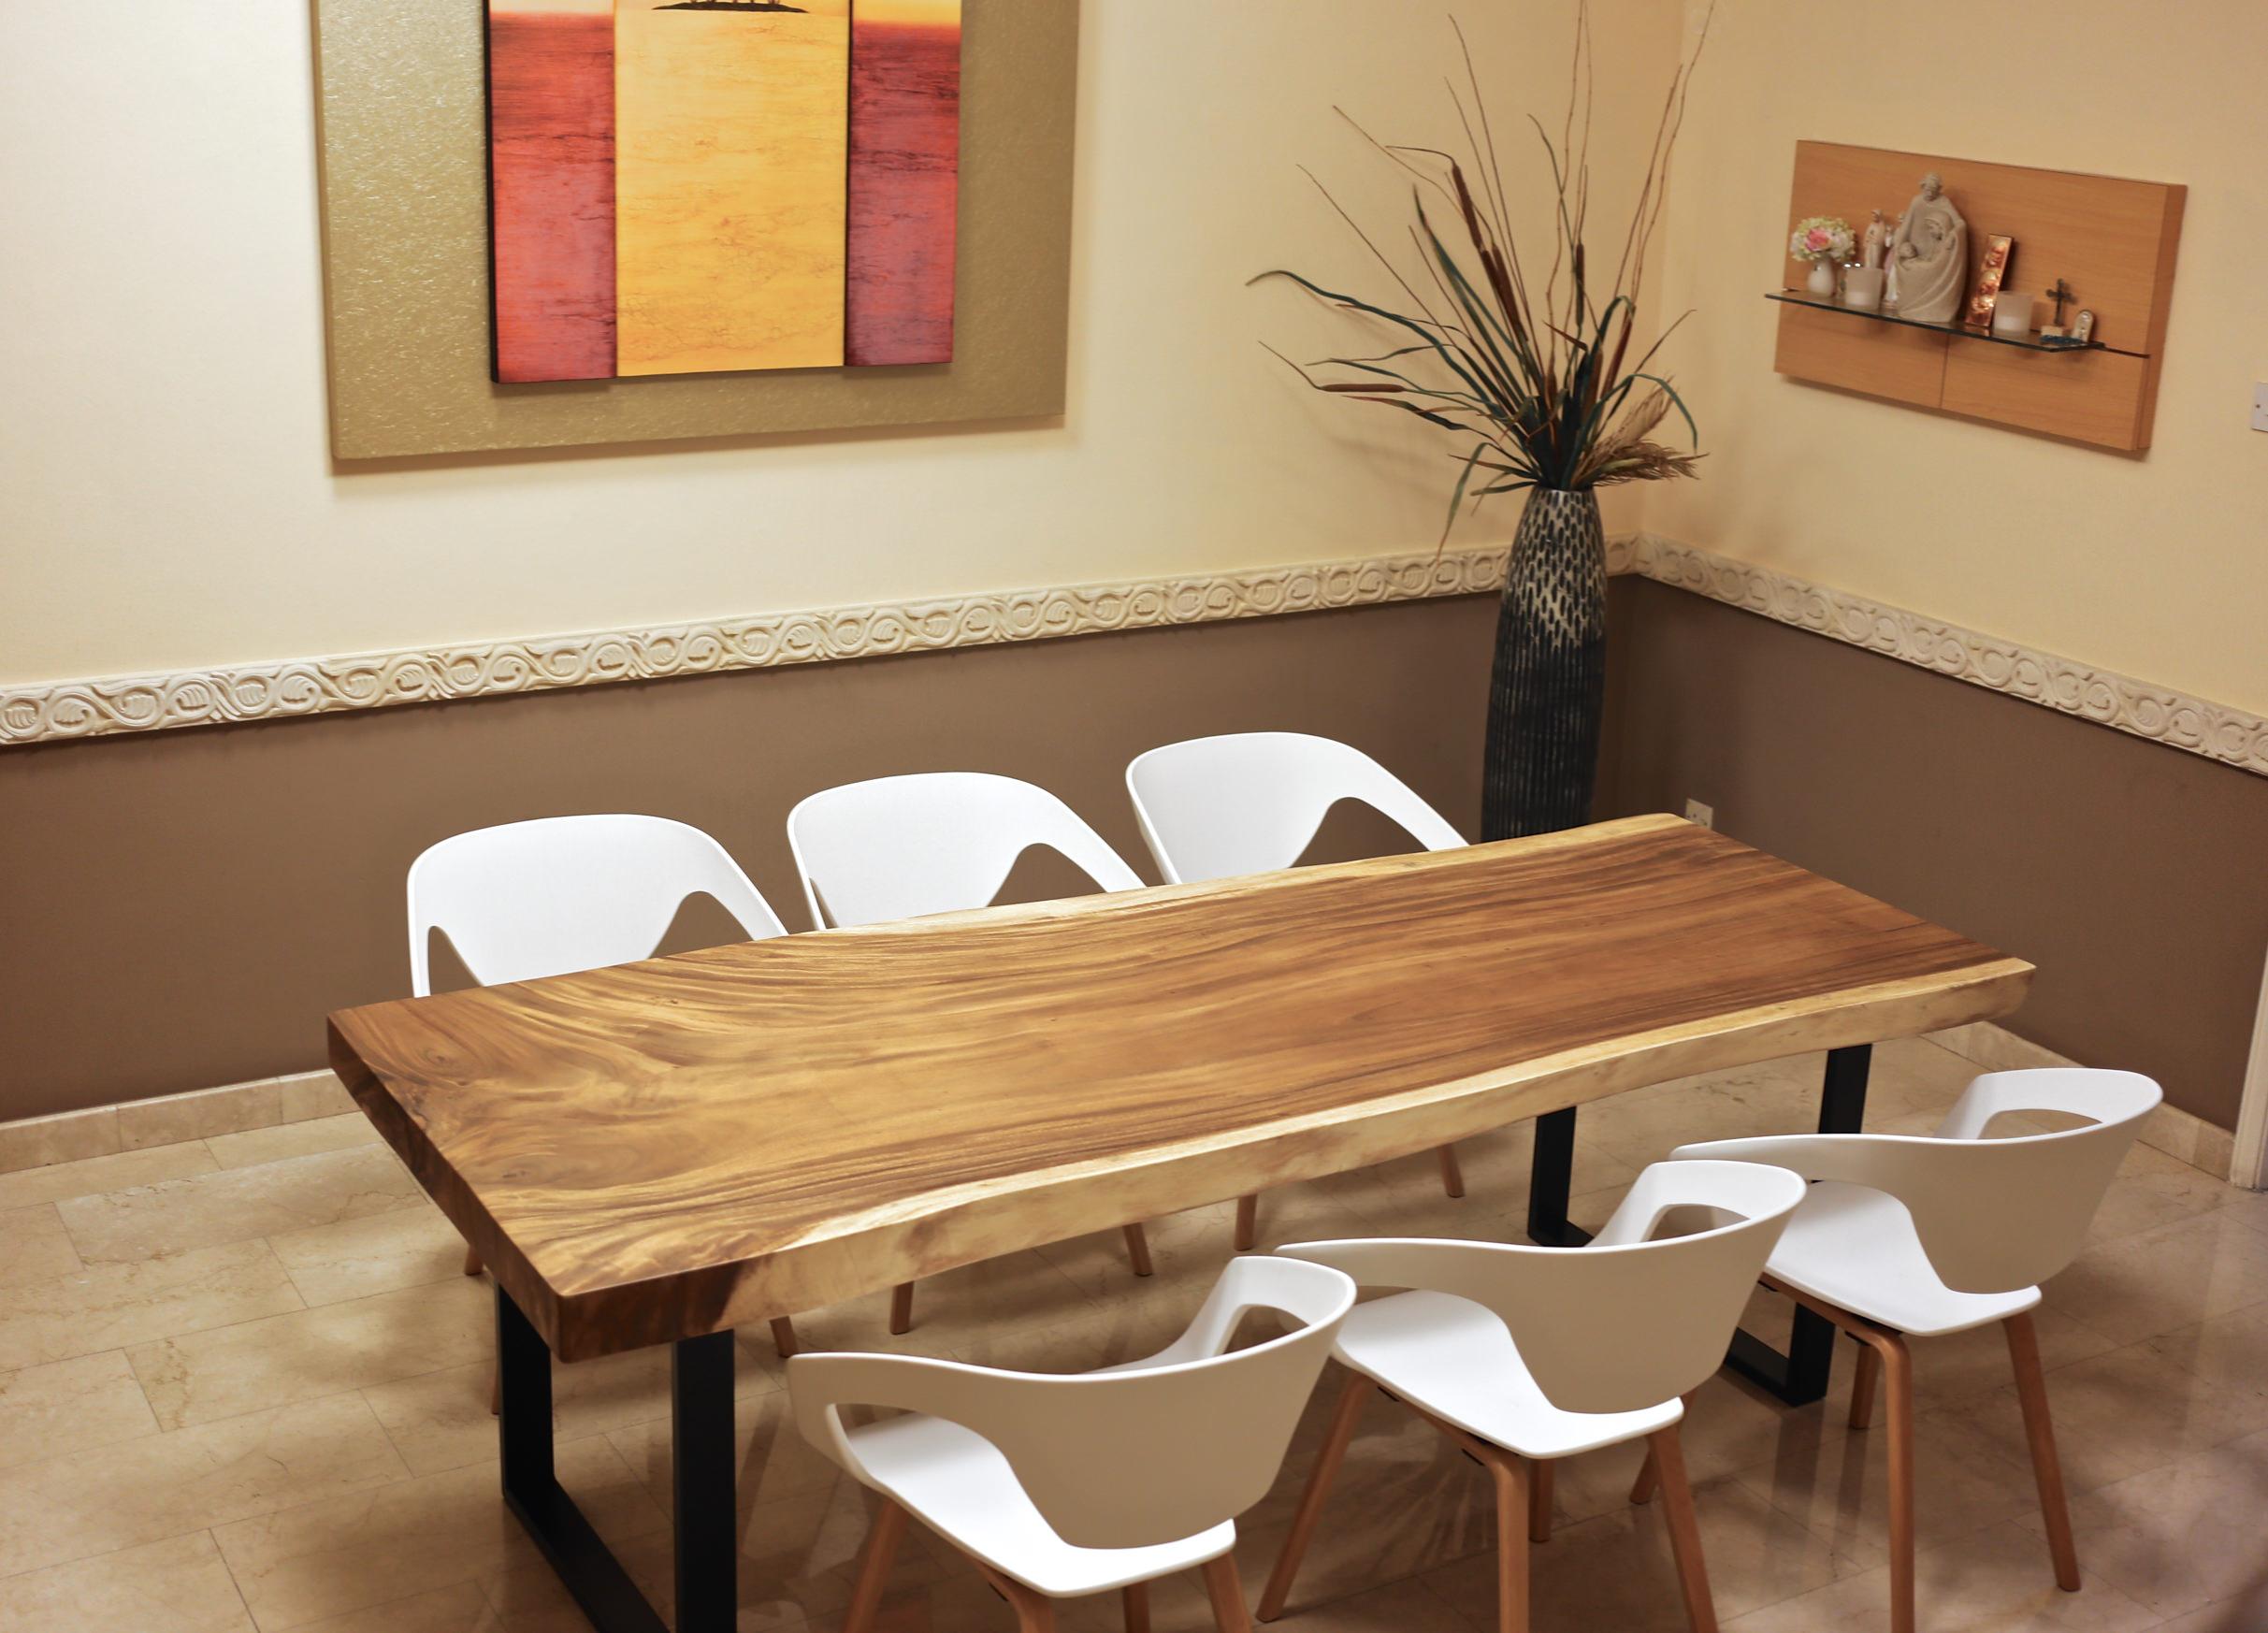 Suar Wood Dining Table // Herman Furniture Singapore.jpg